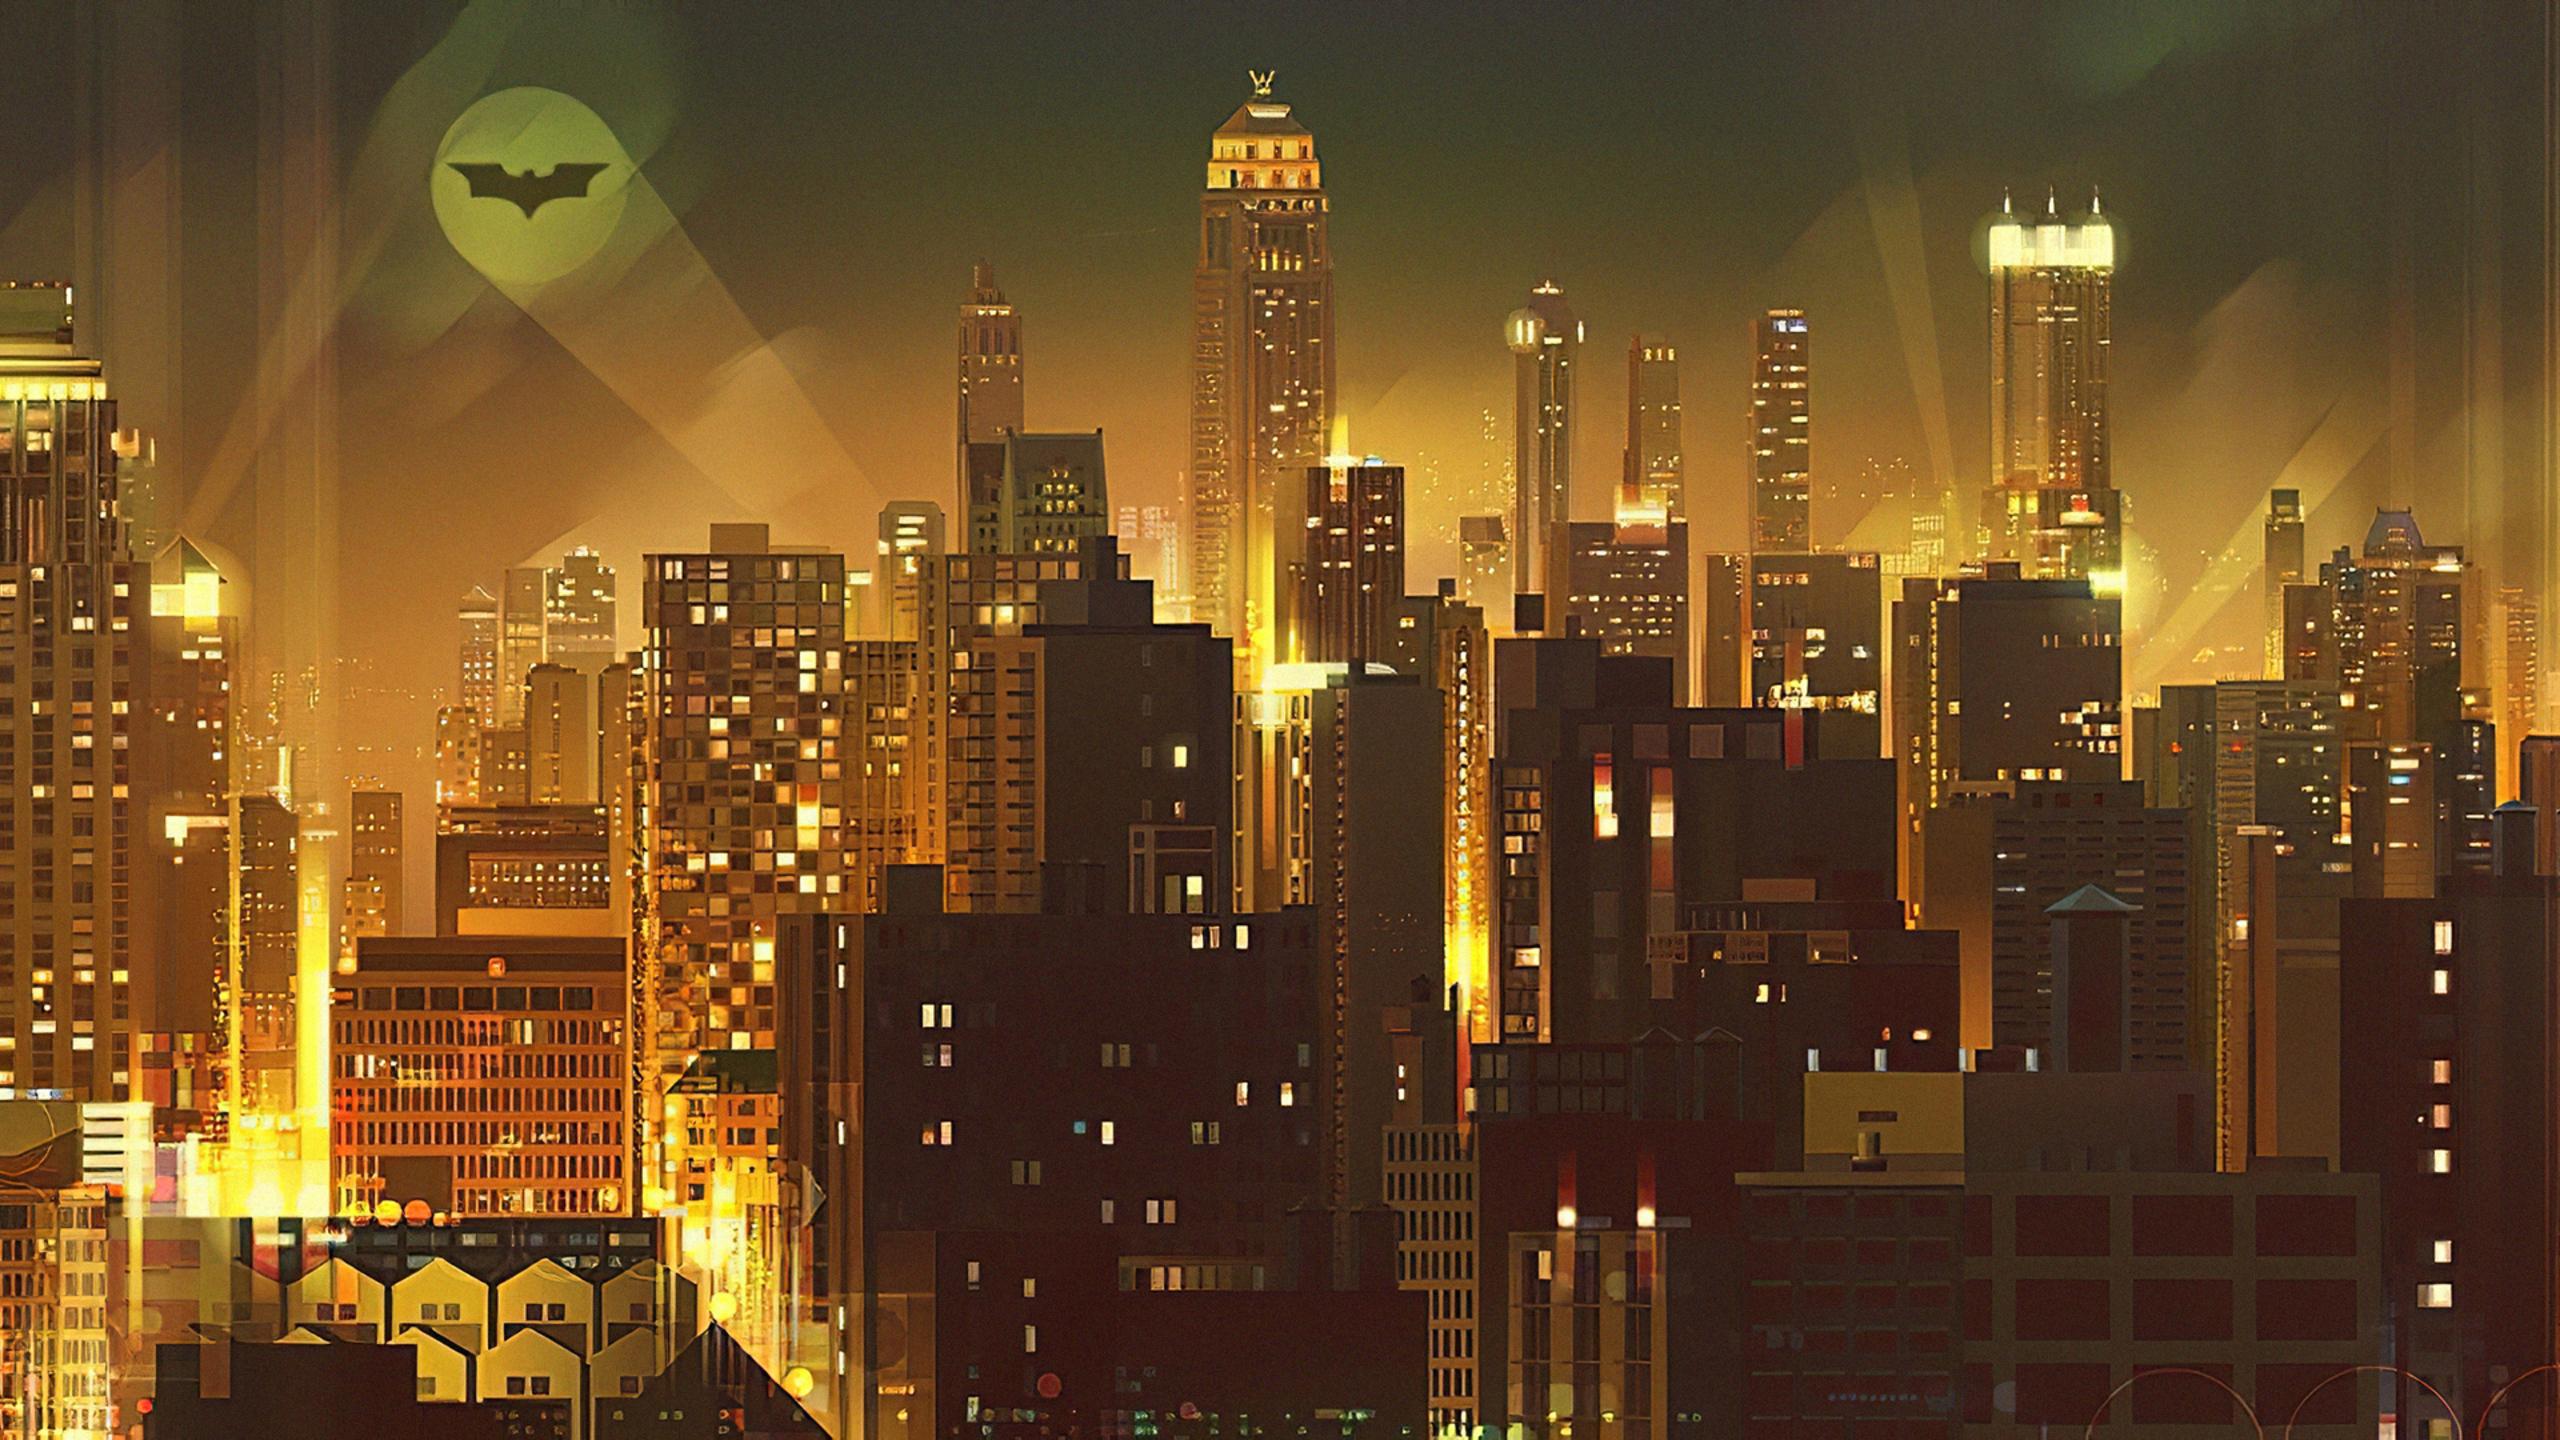 gotham-city-digital-art-4k-jg.jpg